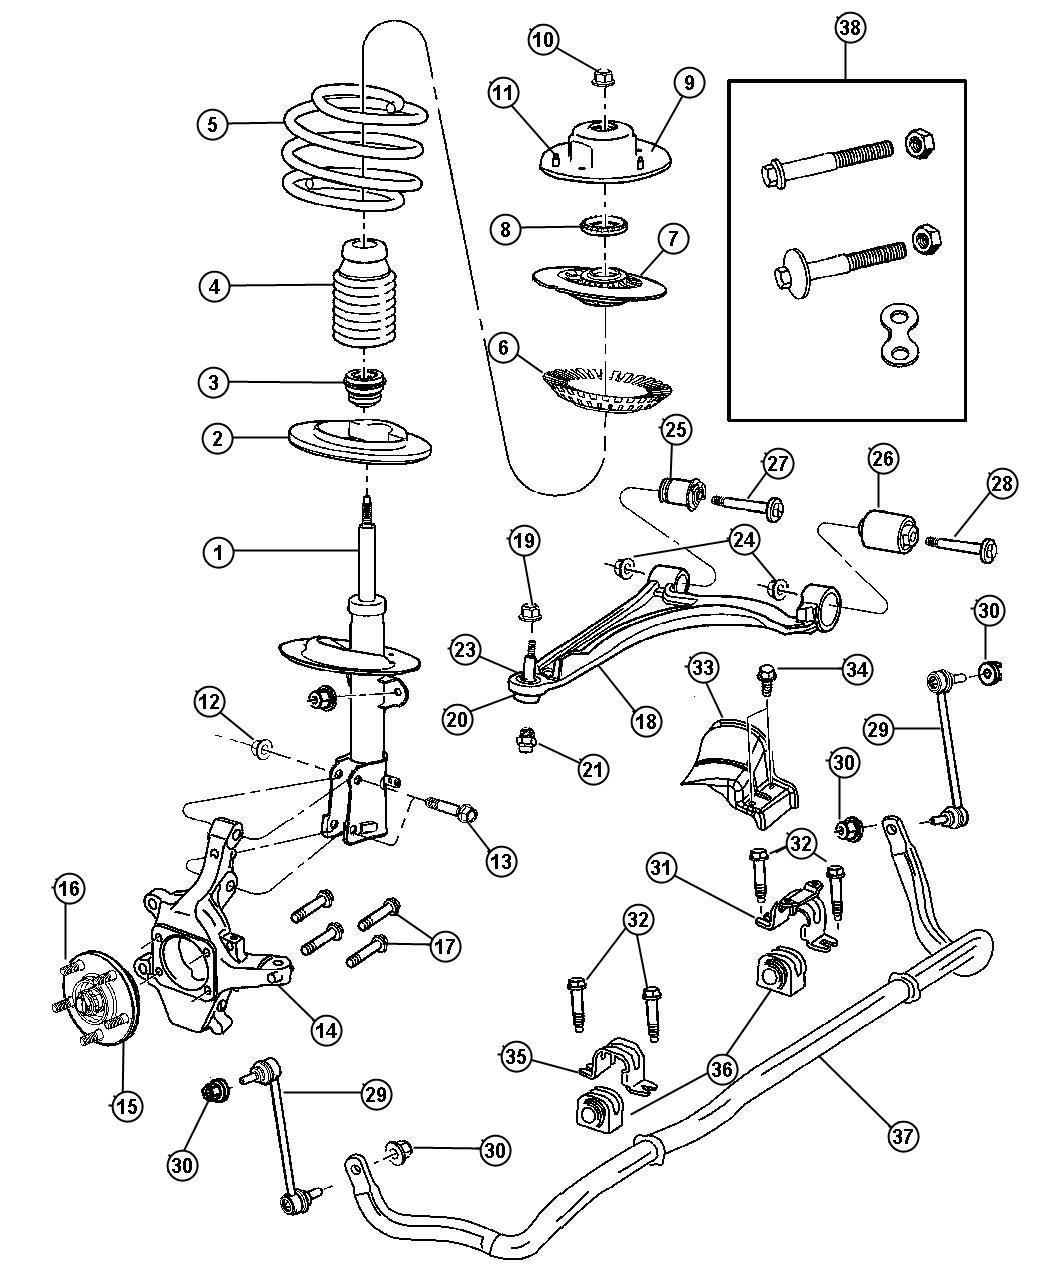 30 Dodge Caravan Front Suspension Diagram